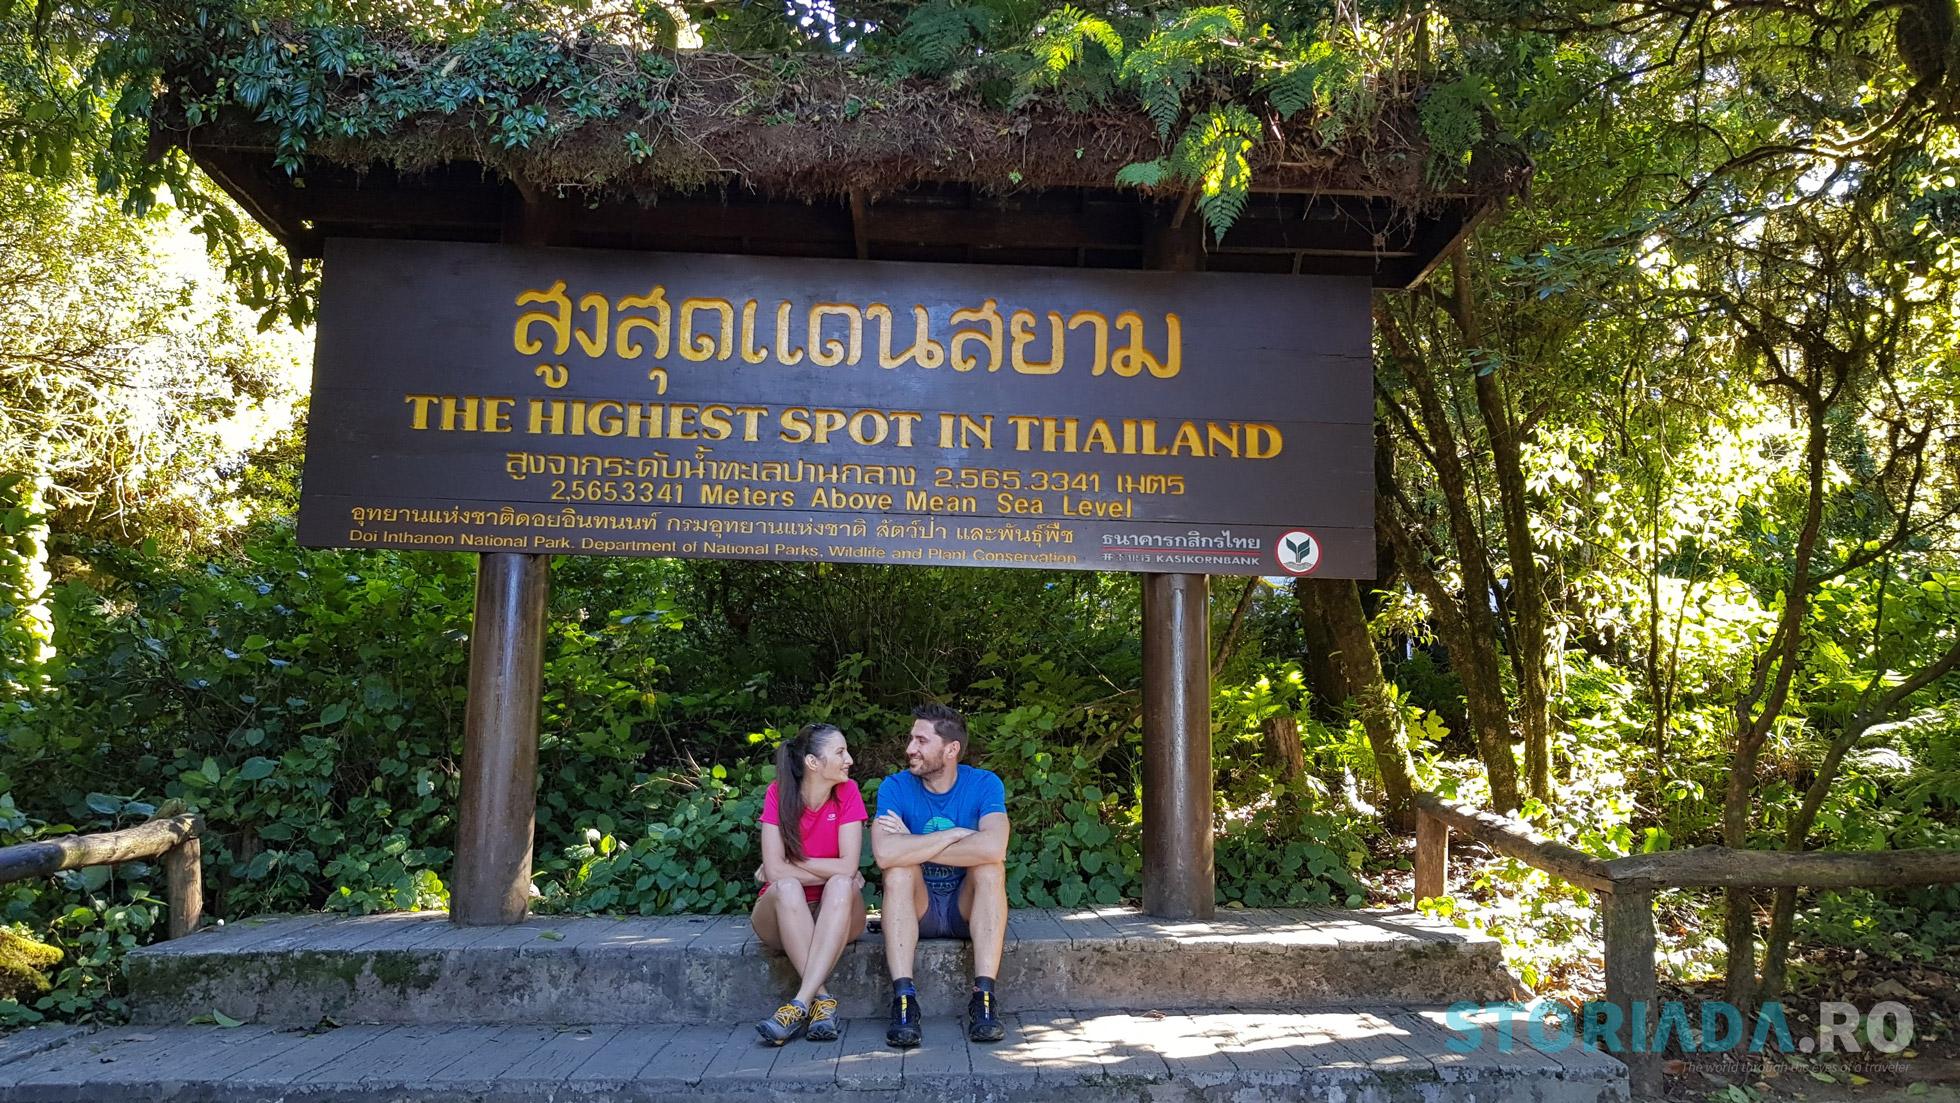 Highest spot in Thailand, Chiang Mai, Tailanda